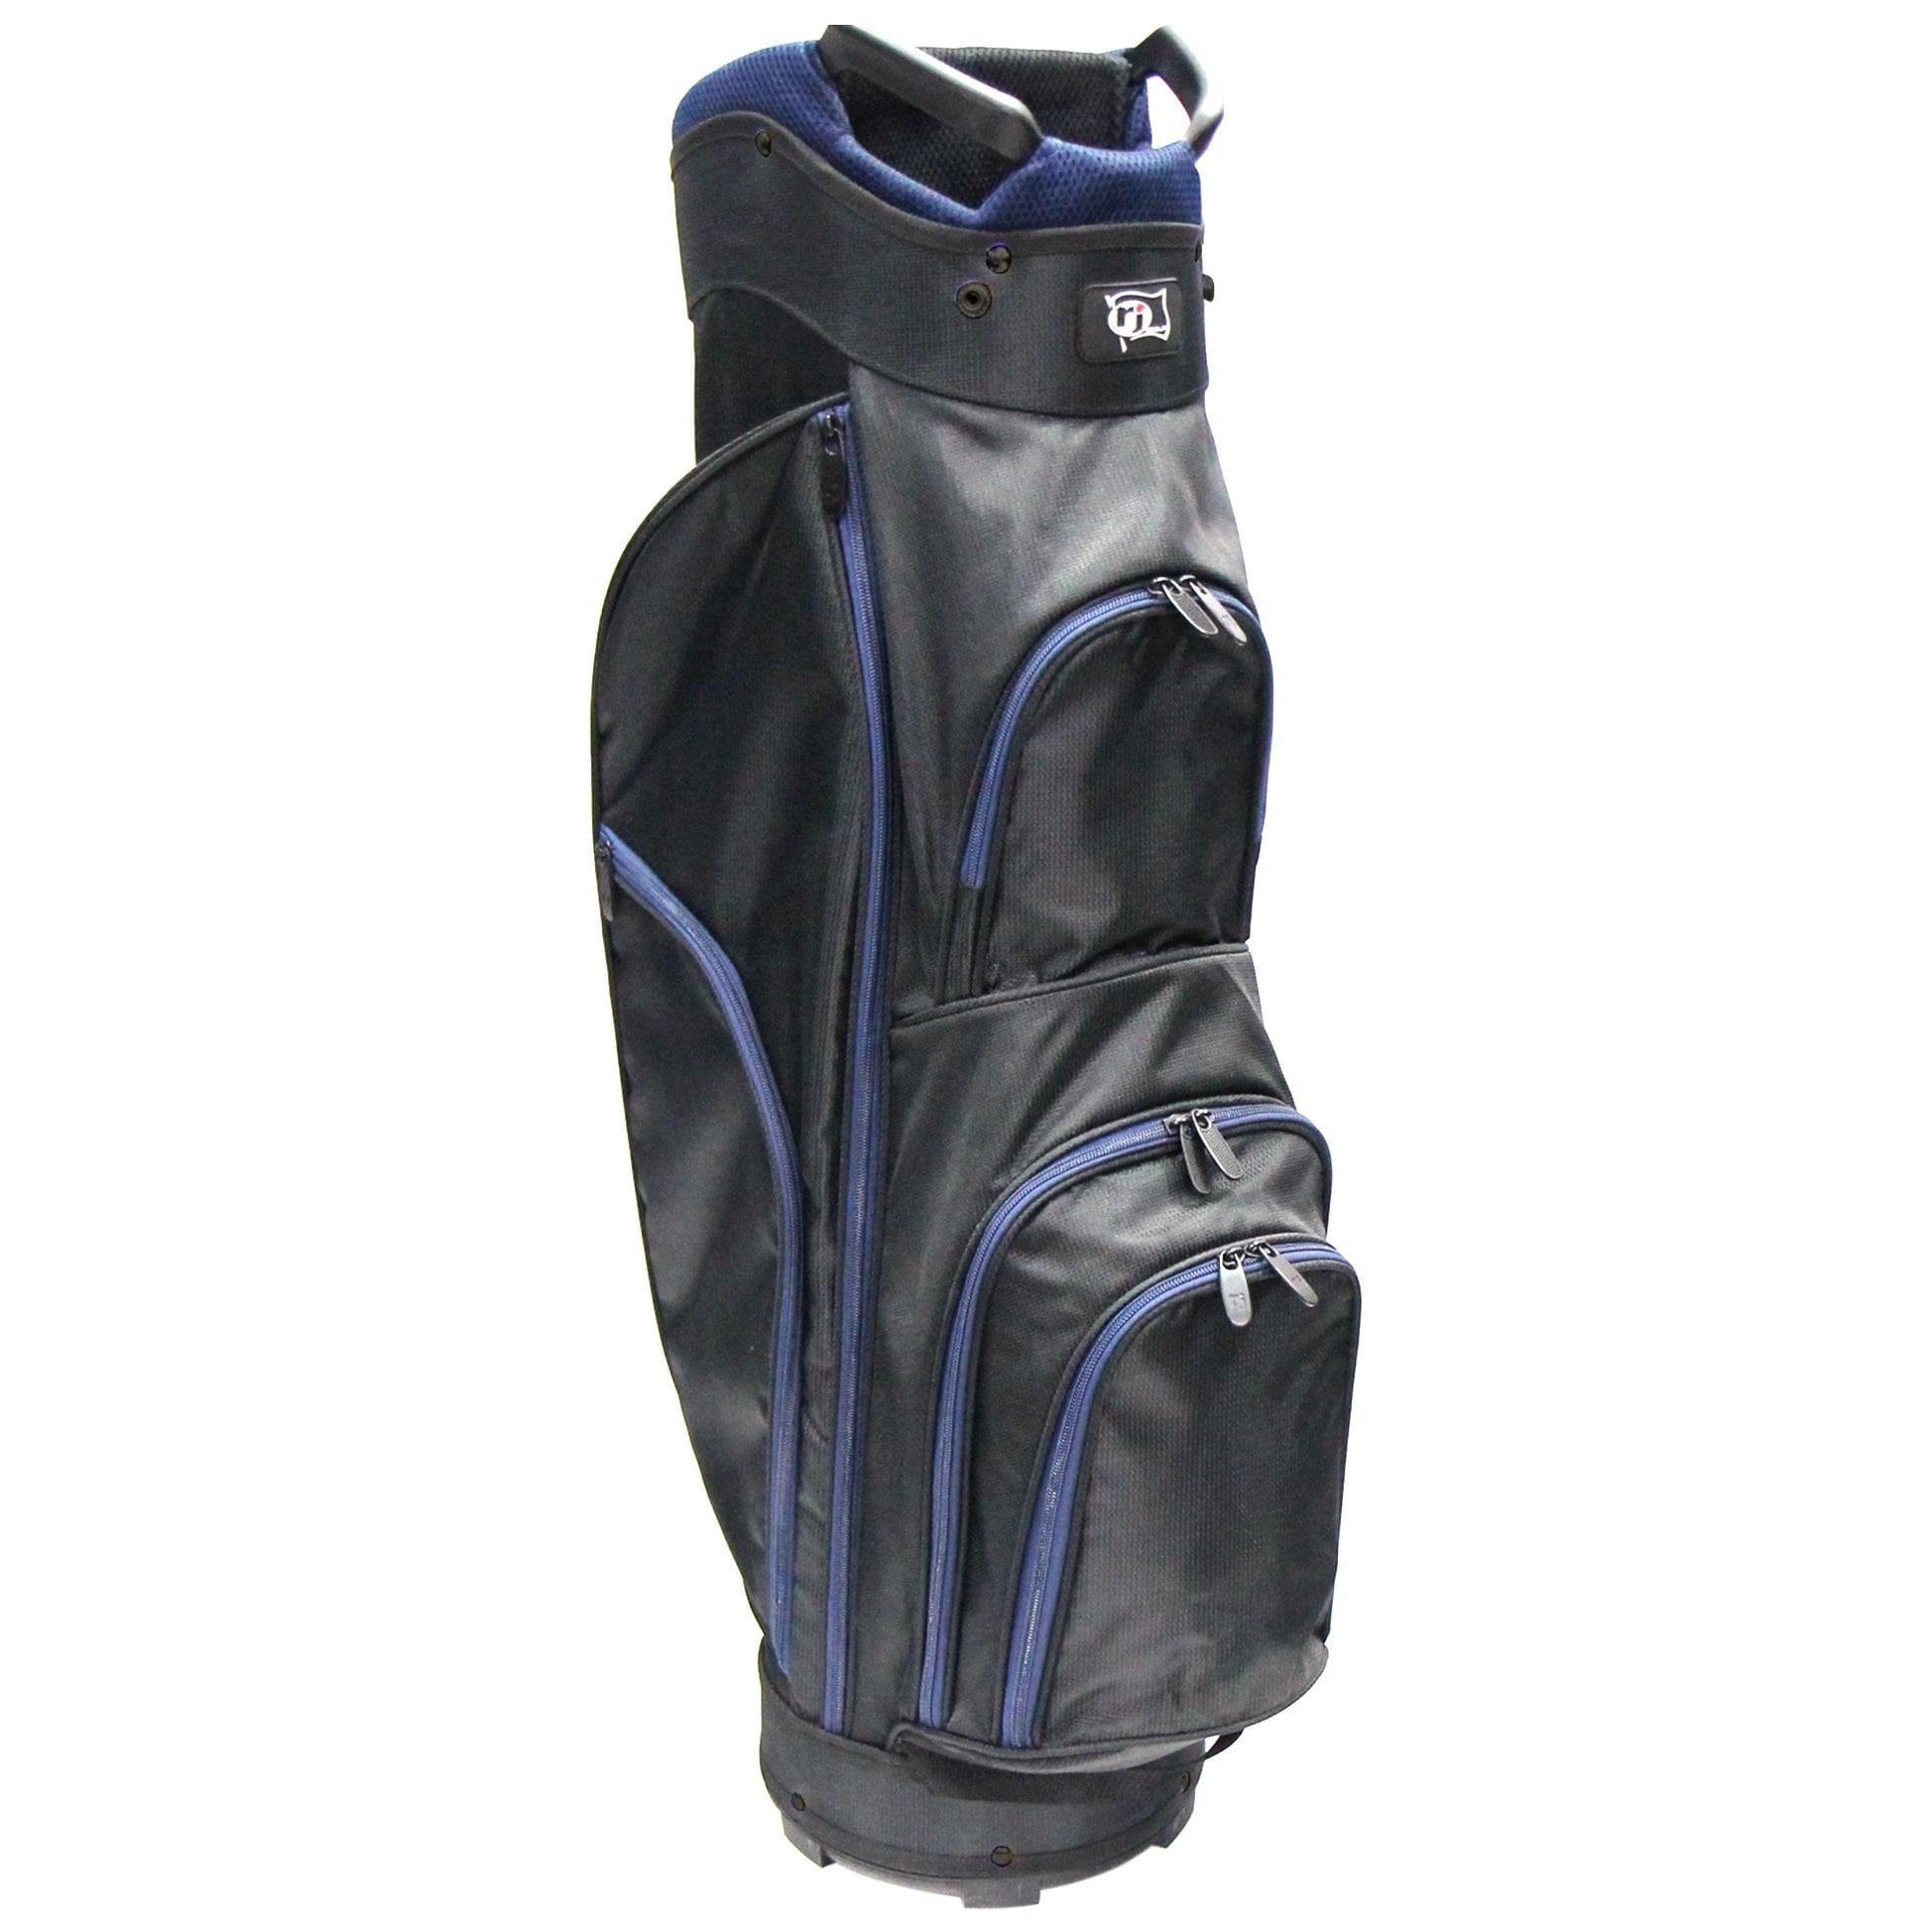 Rj Sports CC-490 Black Nylon 9-inch Starter Cart Bag (Bla...